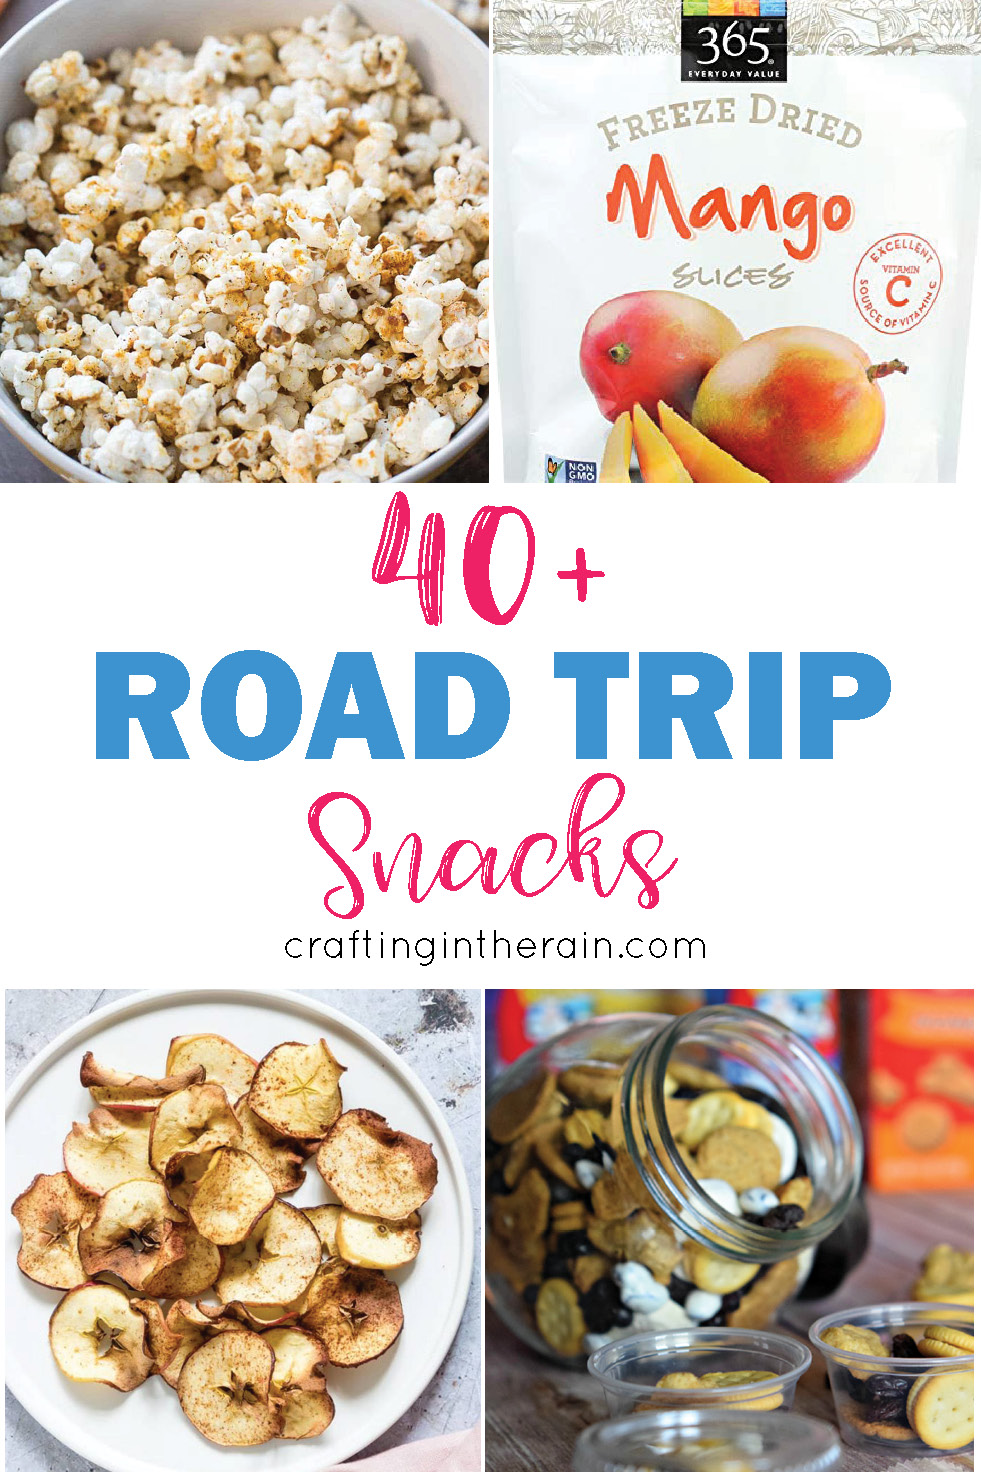 43 Road Trip Snacks Crafting In The Rain